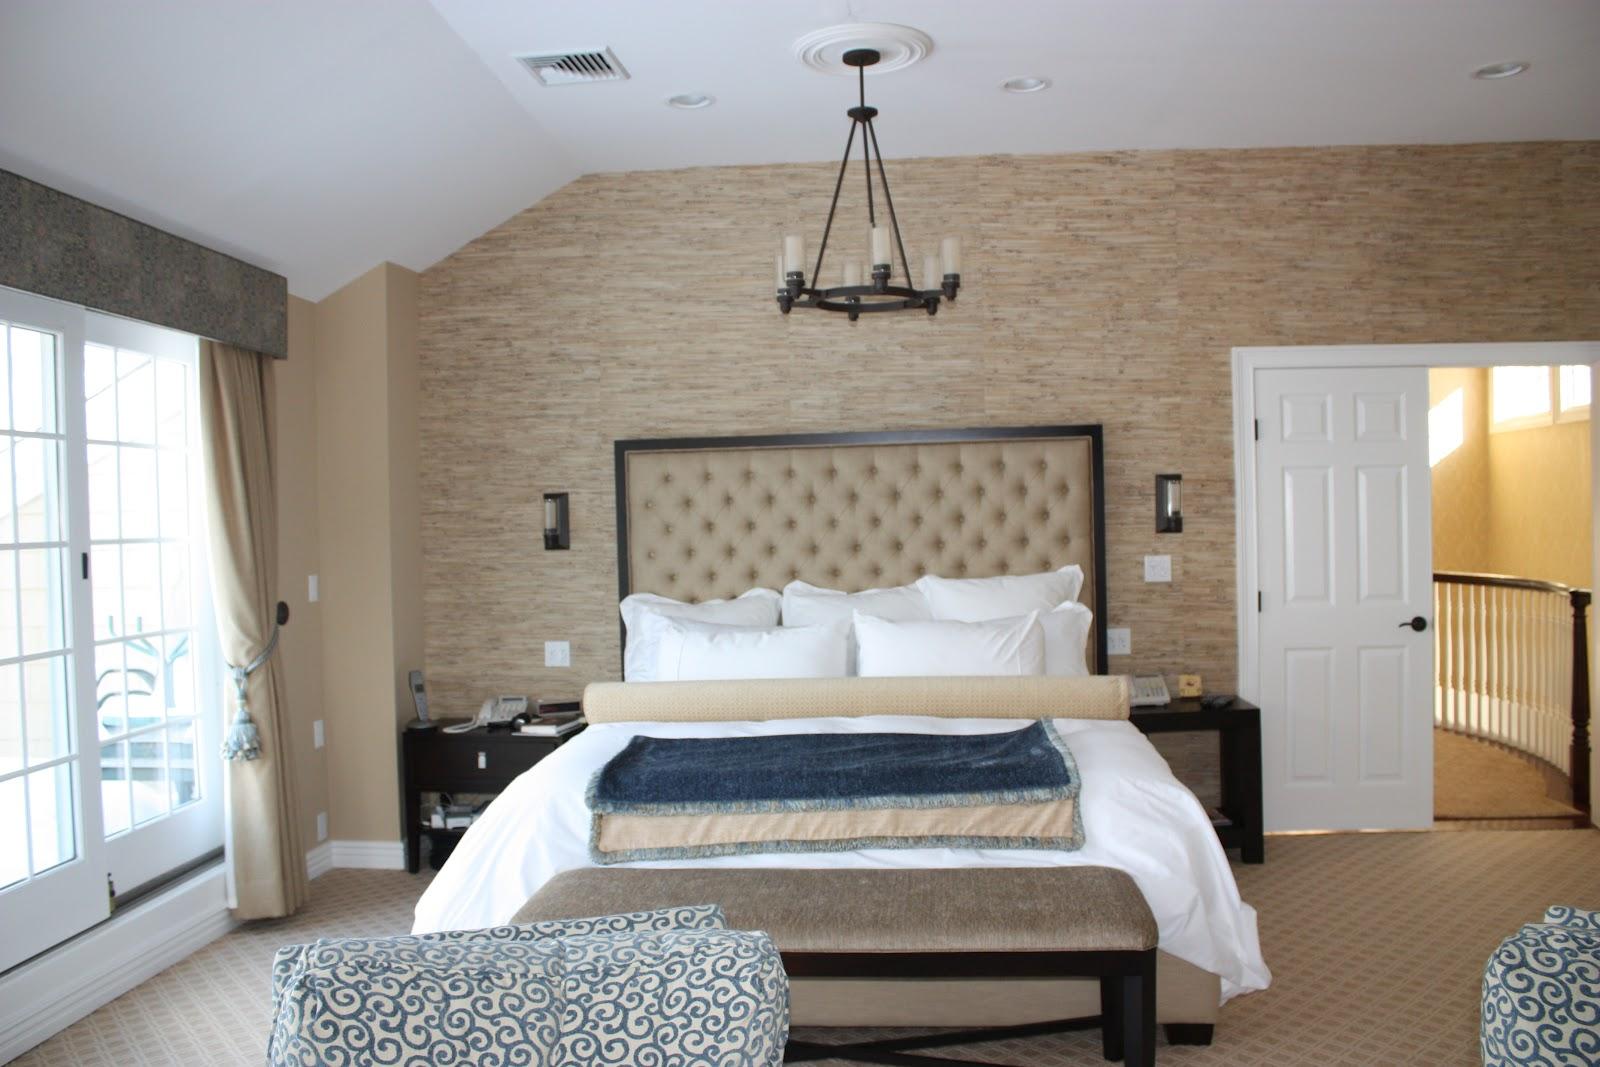 kardashian interior design and romantic rooms design to dreams. Black Bedroom Furniture Sets. Home Design Ideas